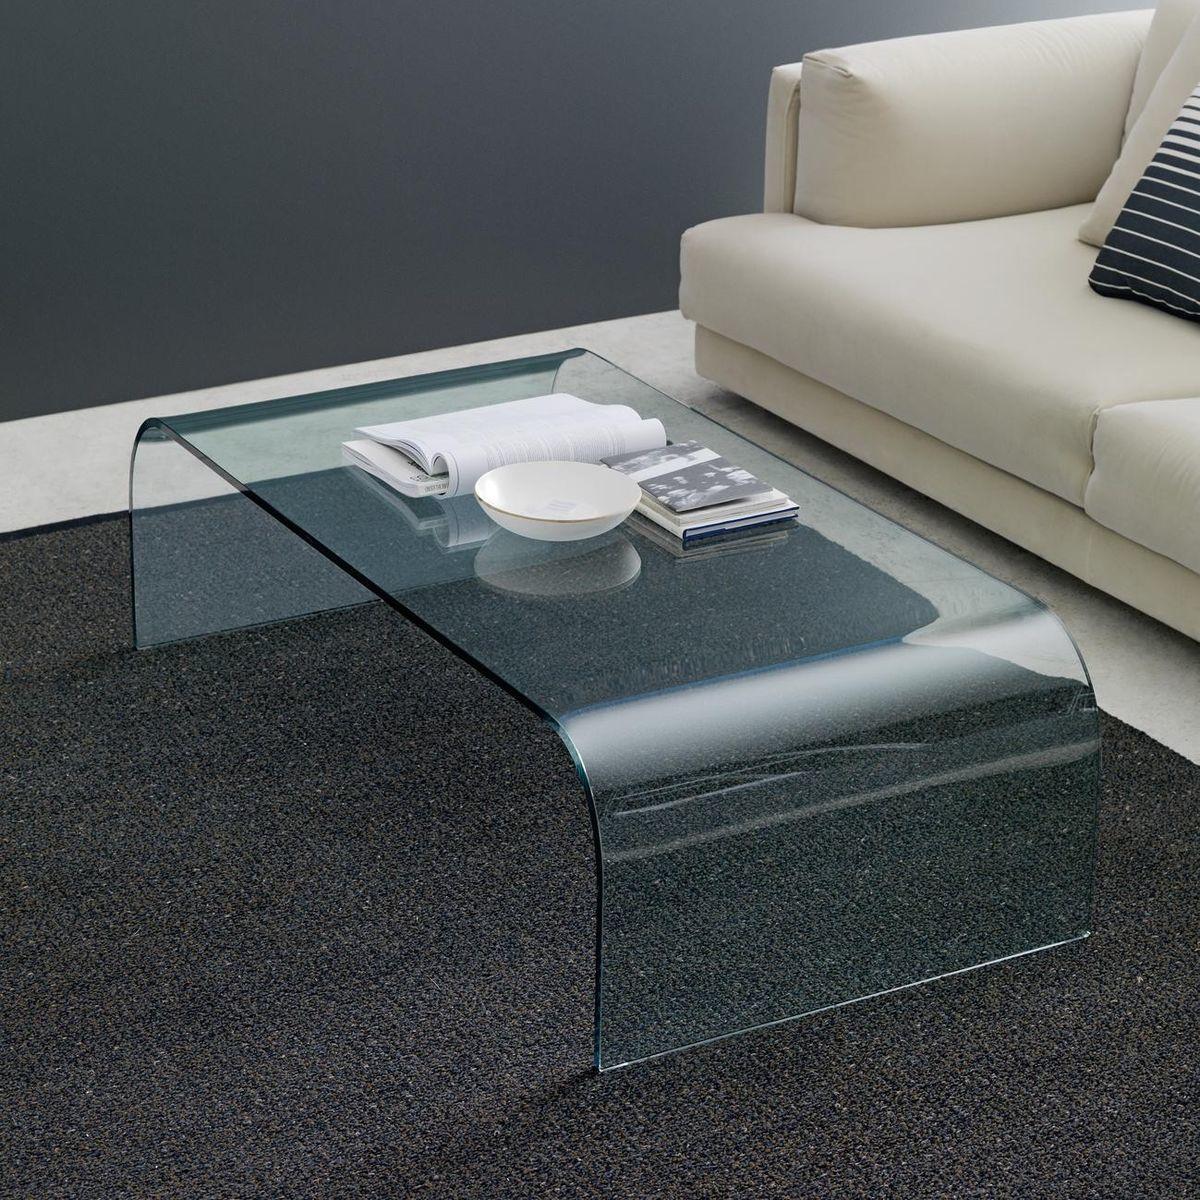 glastisch couchtisch fototapete 2017. Black Bedroom Furniture Sets. Home Design Ideas